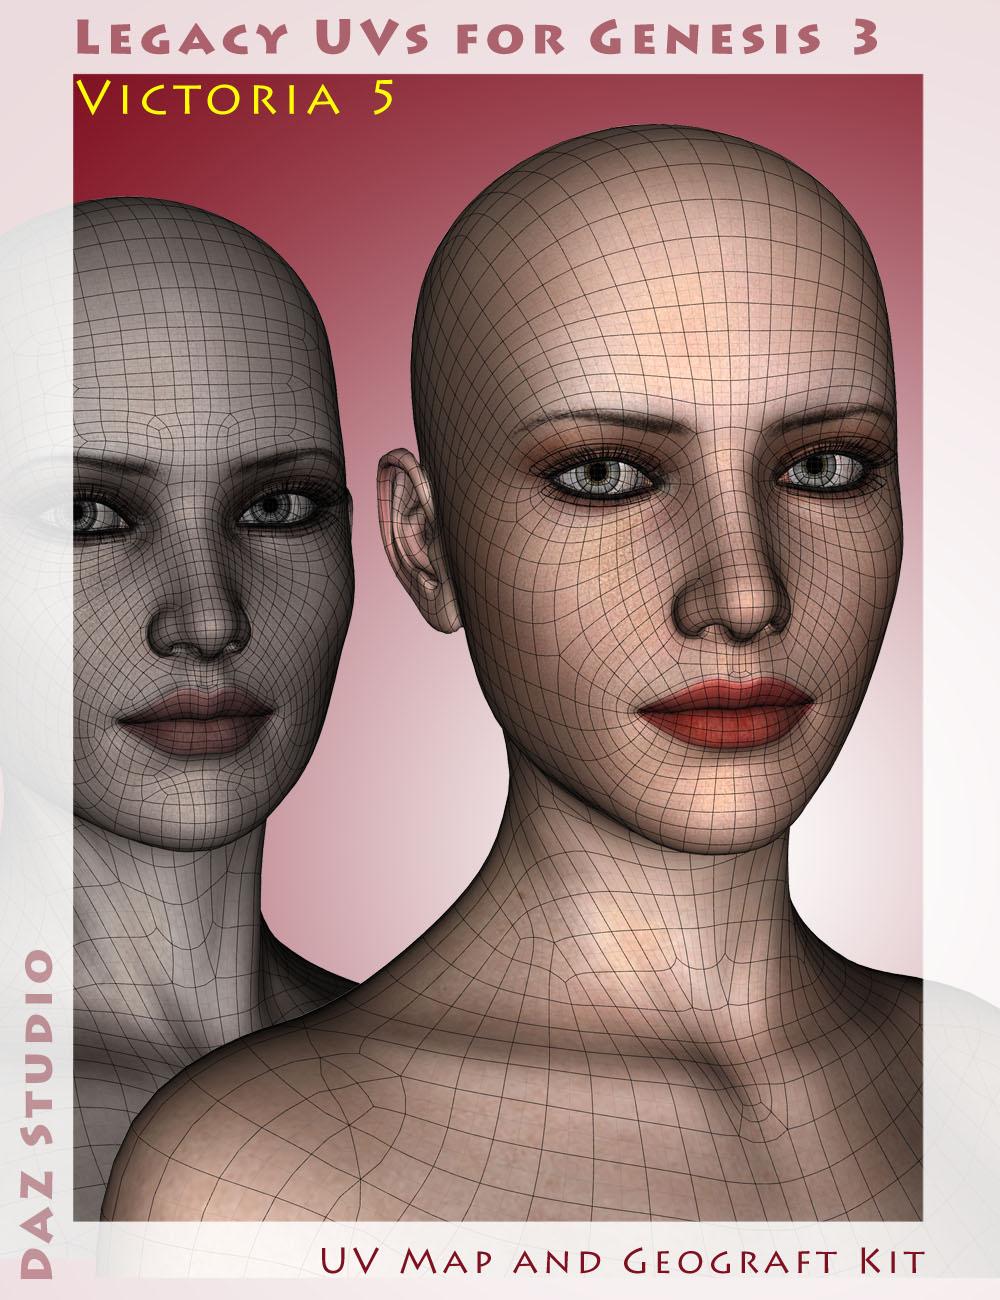 Legacy UVs for Genesis 3: Victoria 5 by: Cayman Studios, 3D Models by Daz 3D